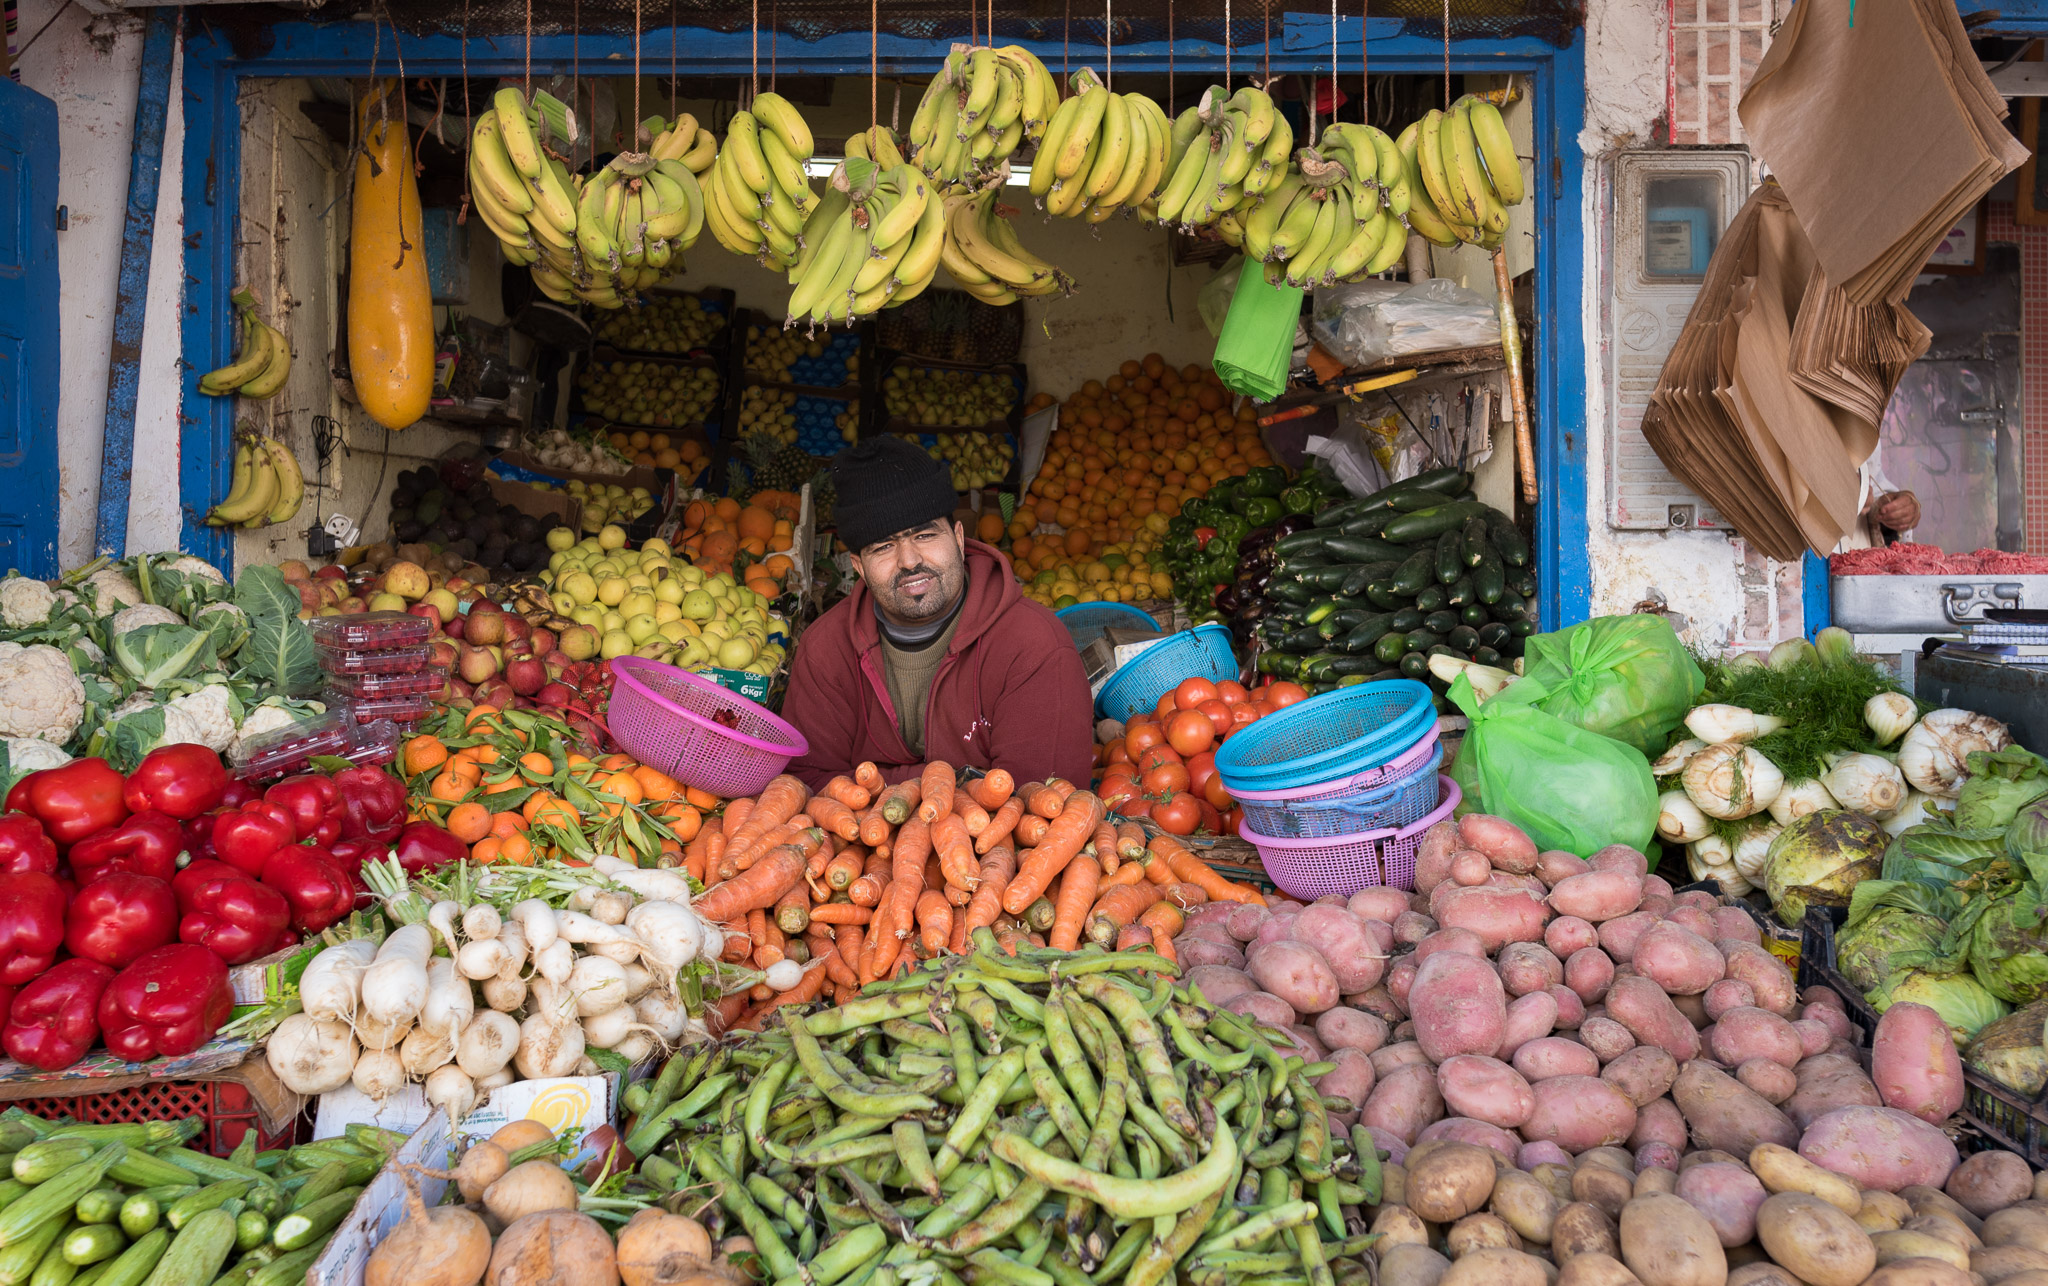 Obstverkäufer in Essaouira